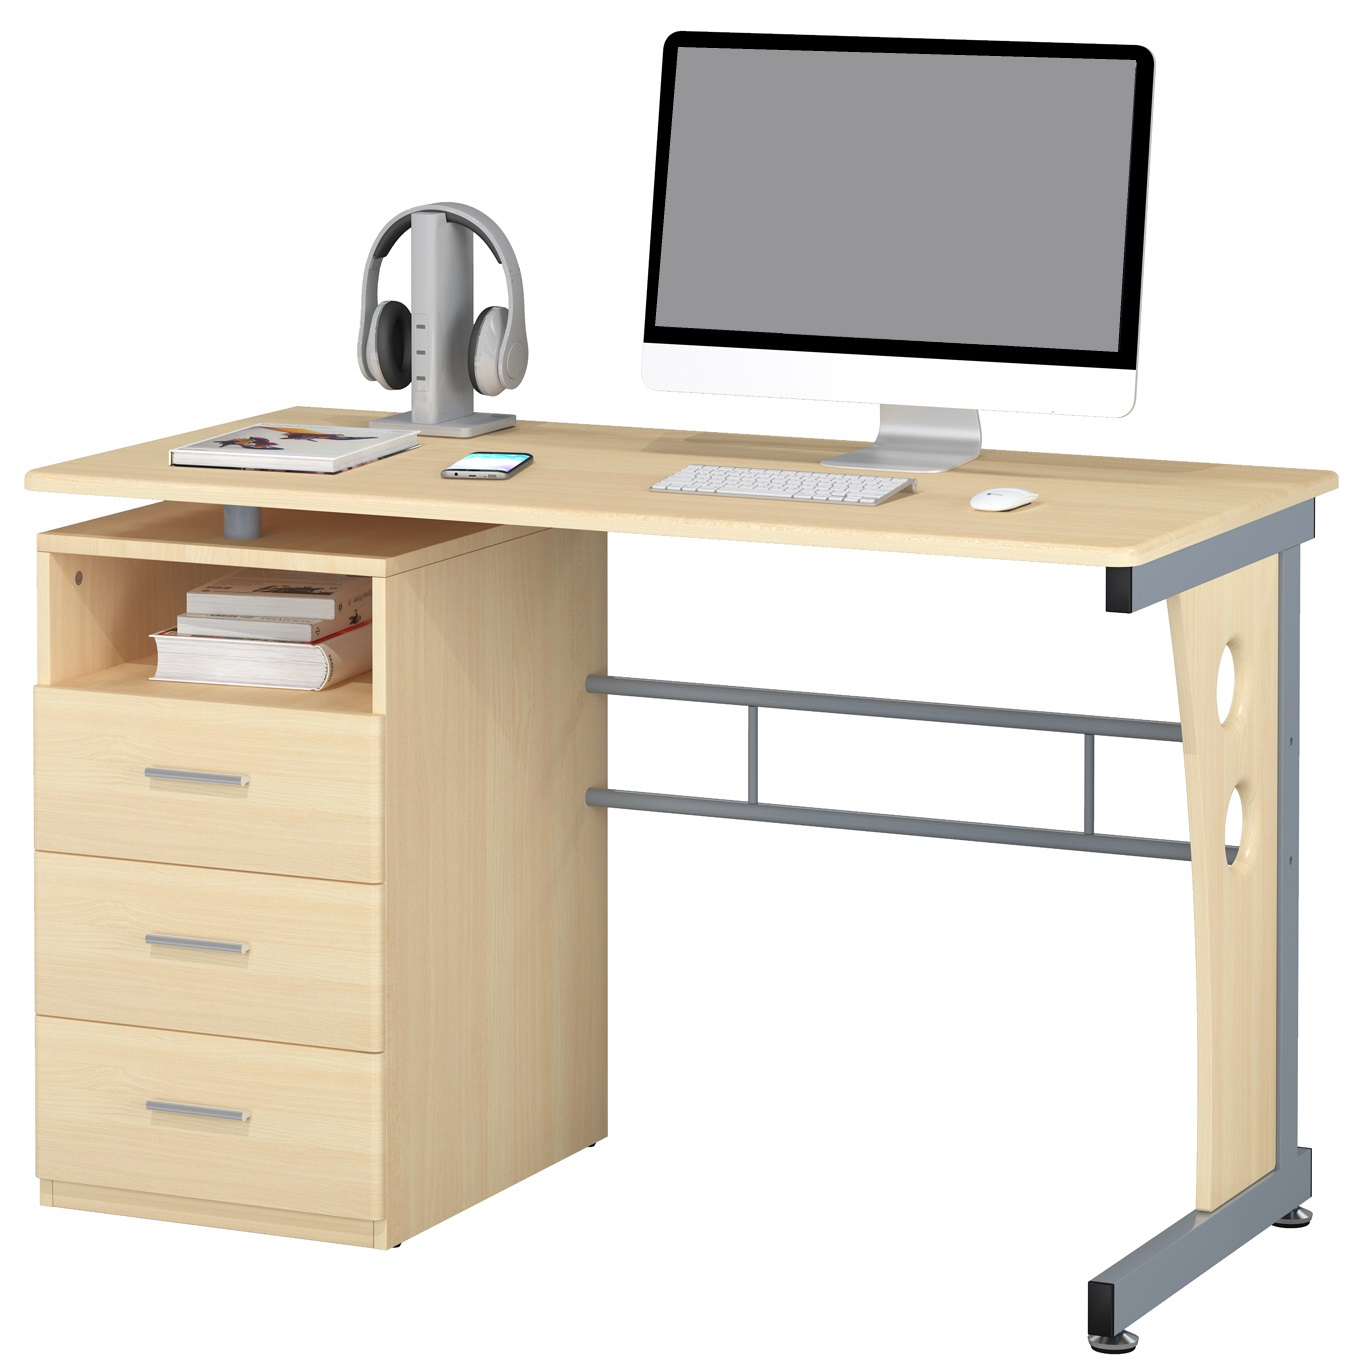 sixbros mesa ordenador mesa oficina mesa escritorio diferentes colores s 352 ebay. Black Bedroom Furniture Sets. Home Design Ideas